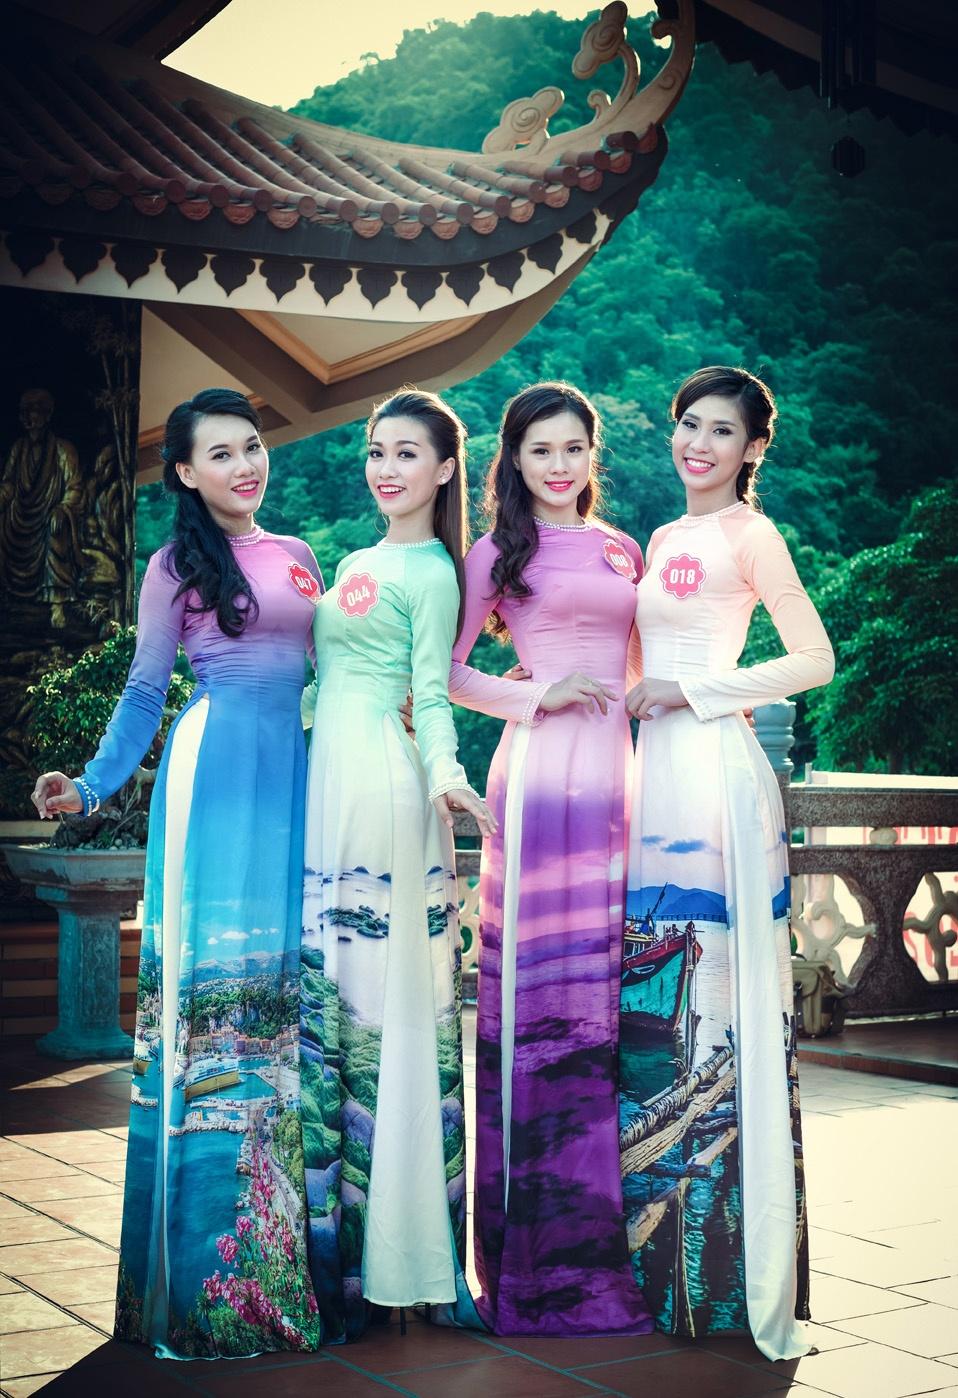 Nguoi dep Hoa hau Bien khoe dang trong ta ao dai hinh anh 6